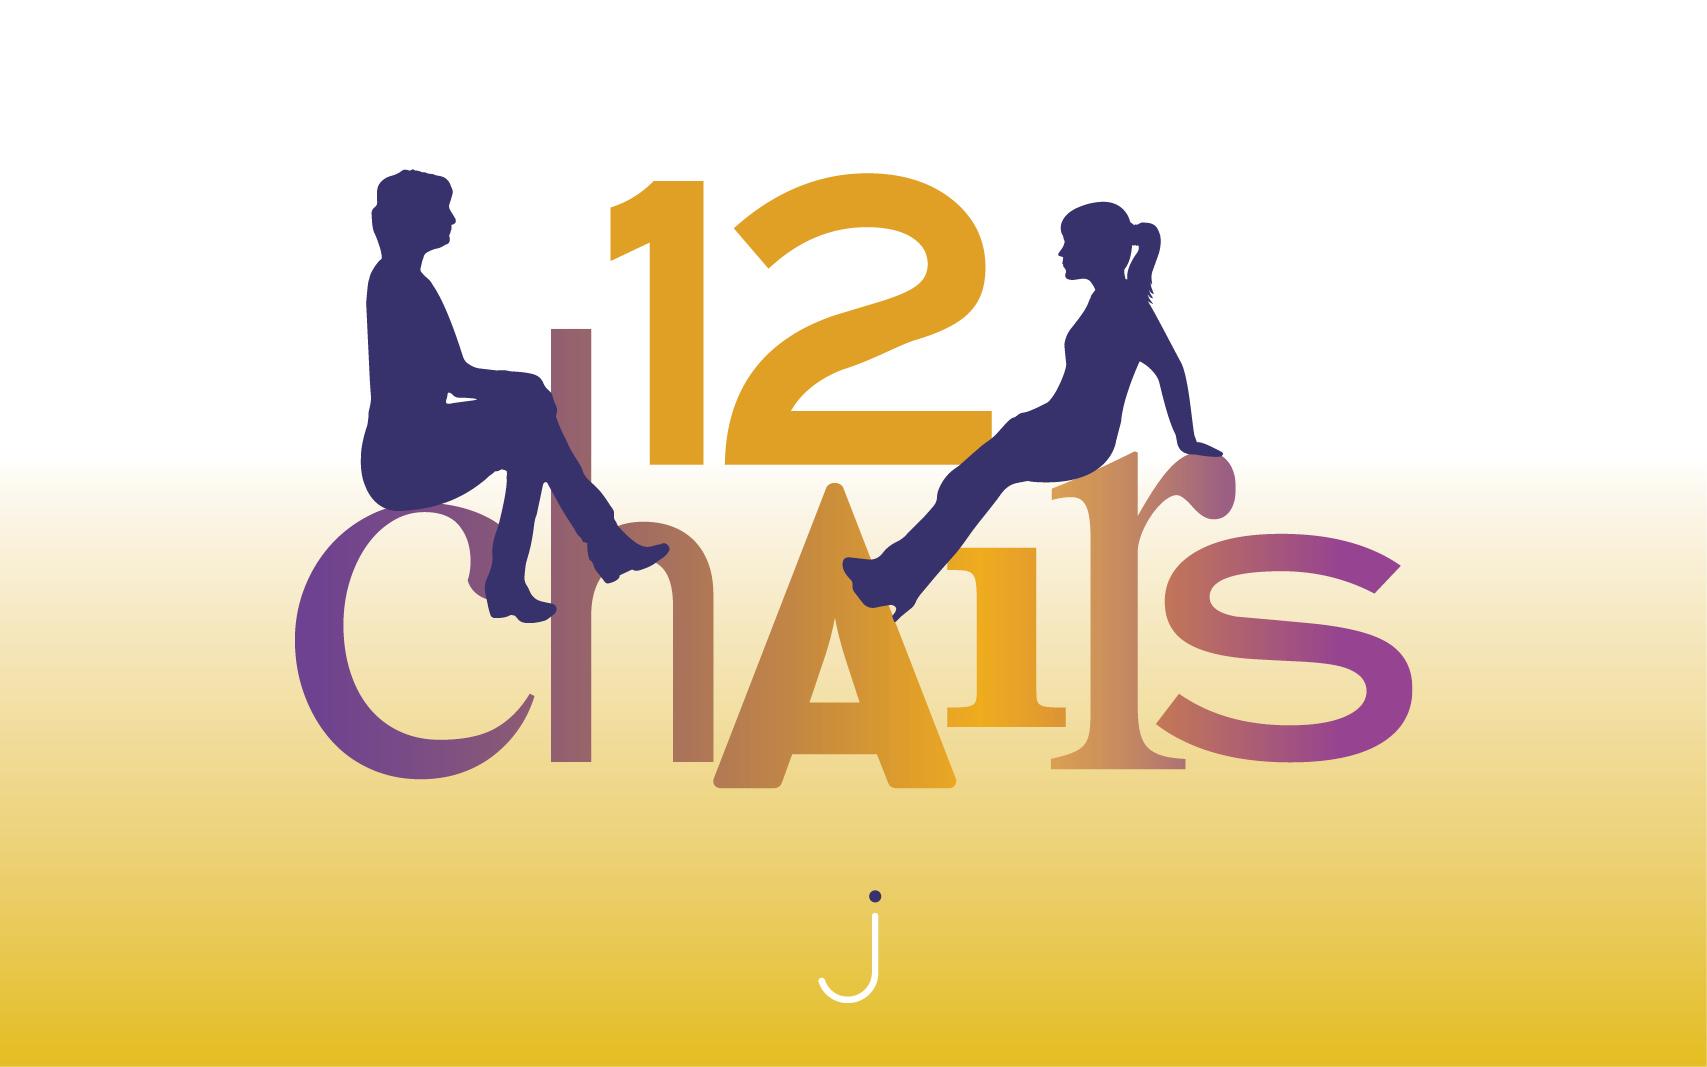 12 Chairs Fringe banner 1280x800.jpg